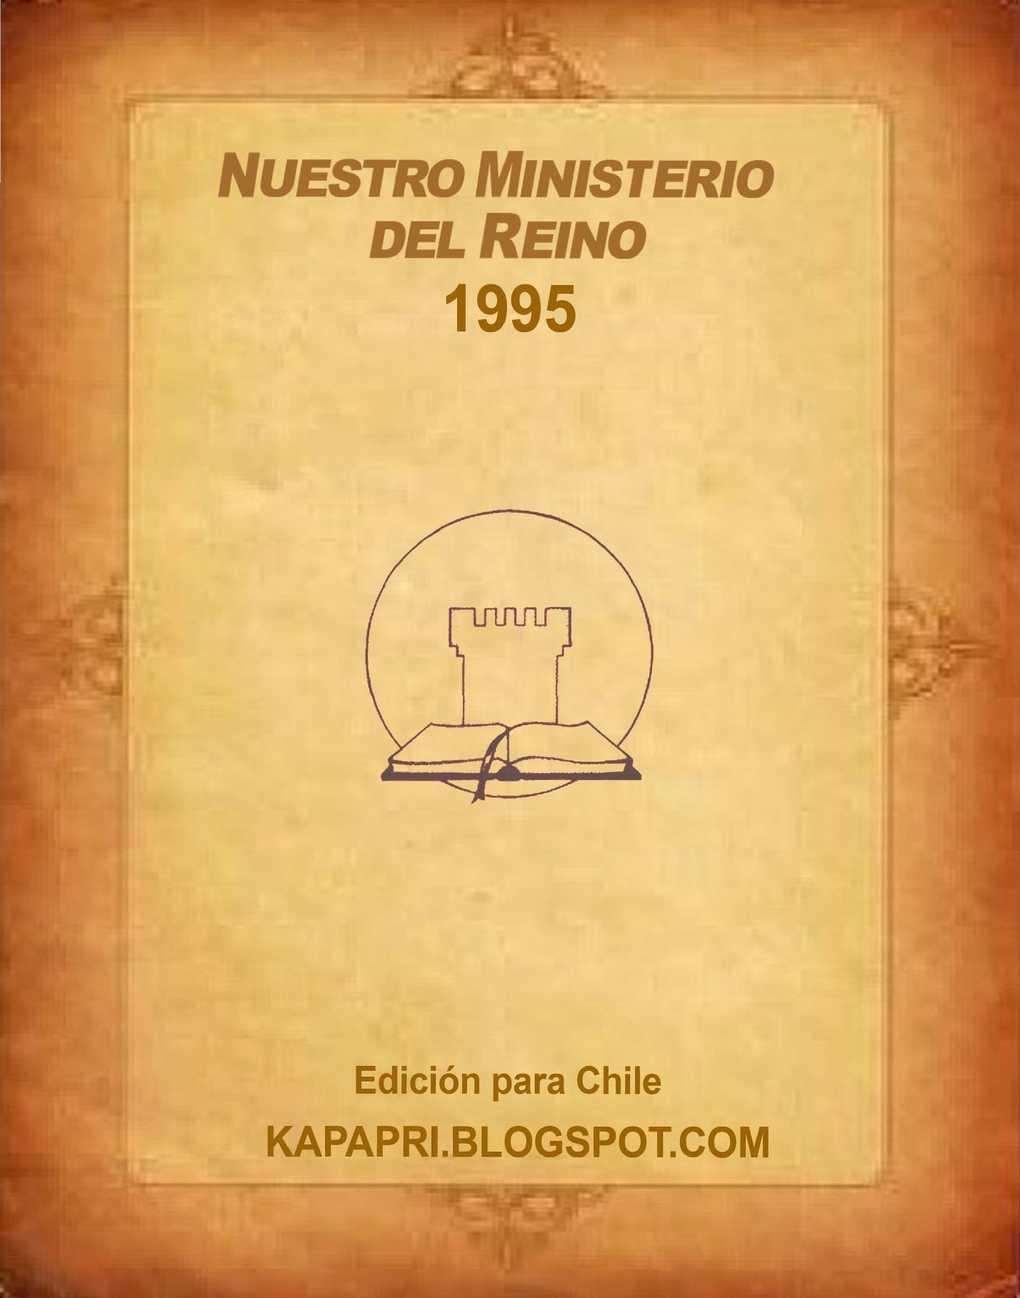 Calaméo - 1995 Nuestro Ministerio del Reino